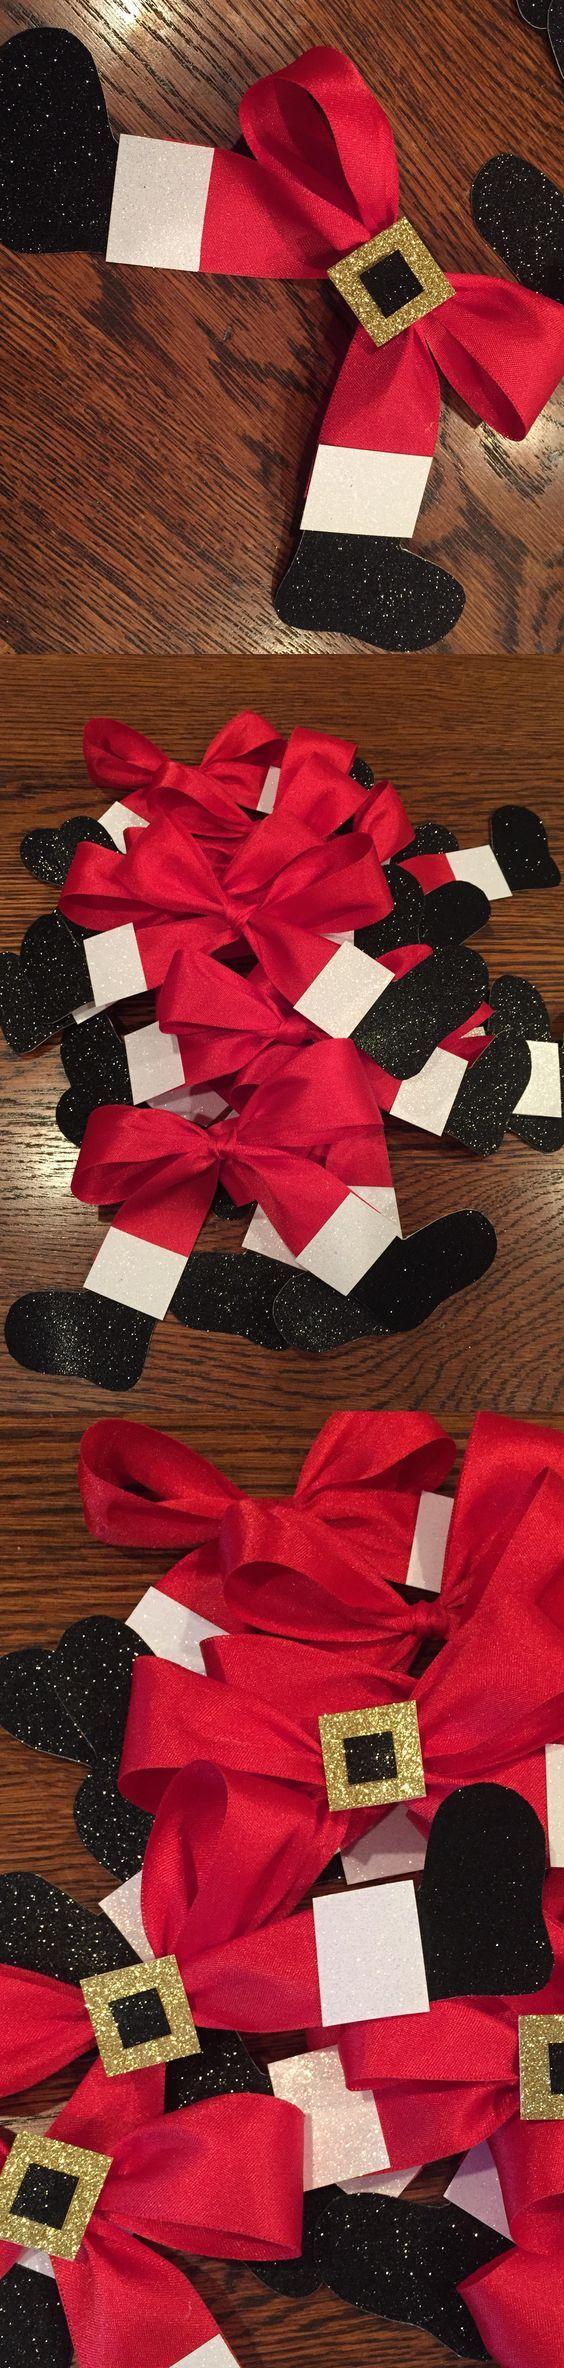 Christmas homemade decoration ideas - 25 Best Ideas About Diy Christmas Wreaths On Pinterest Diy Xmas Decorations Xmas Decorations And Xmas Crafts